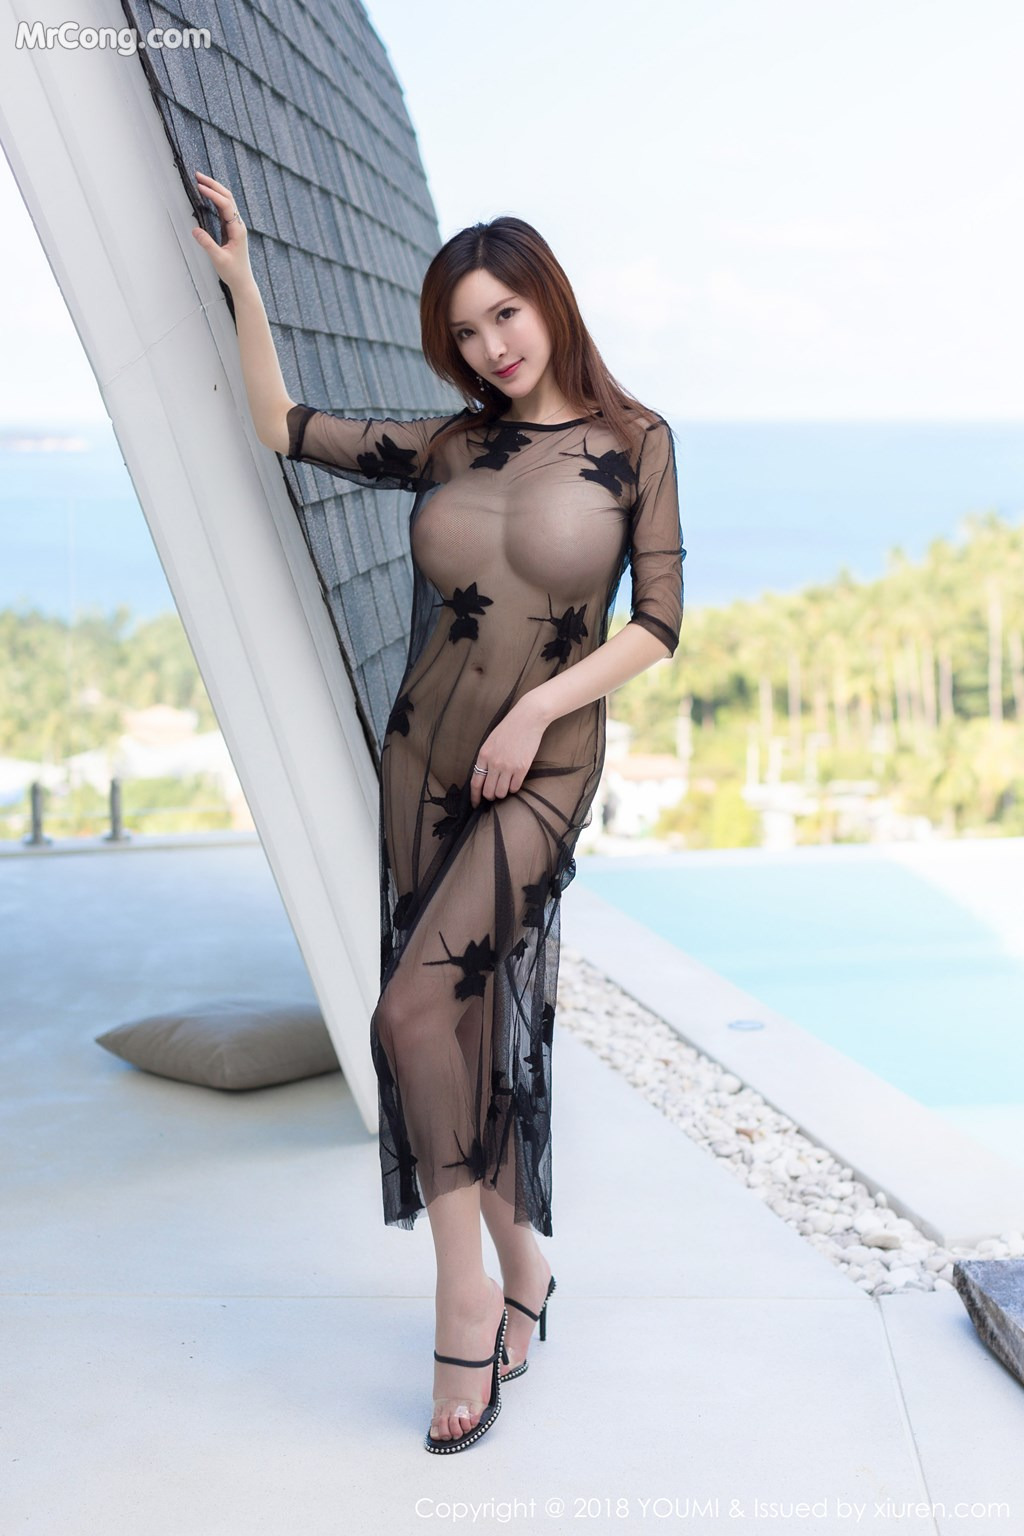 Image YouMi-Vol.223-Tu-Fei-Yuan-Ai-Cuo-Qiong-MrCong.com-001 in post YouMi Vol.223: Người mẫu 奶瓶土肥圆 (49 ảnh)